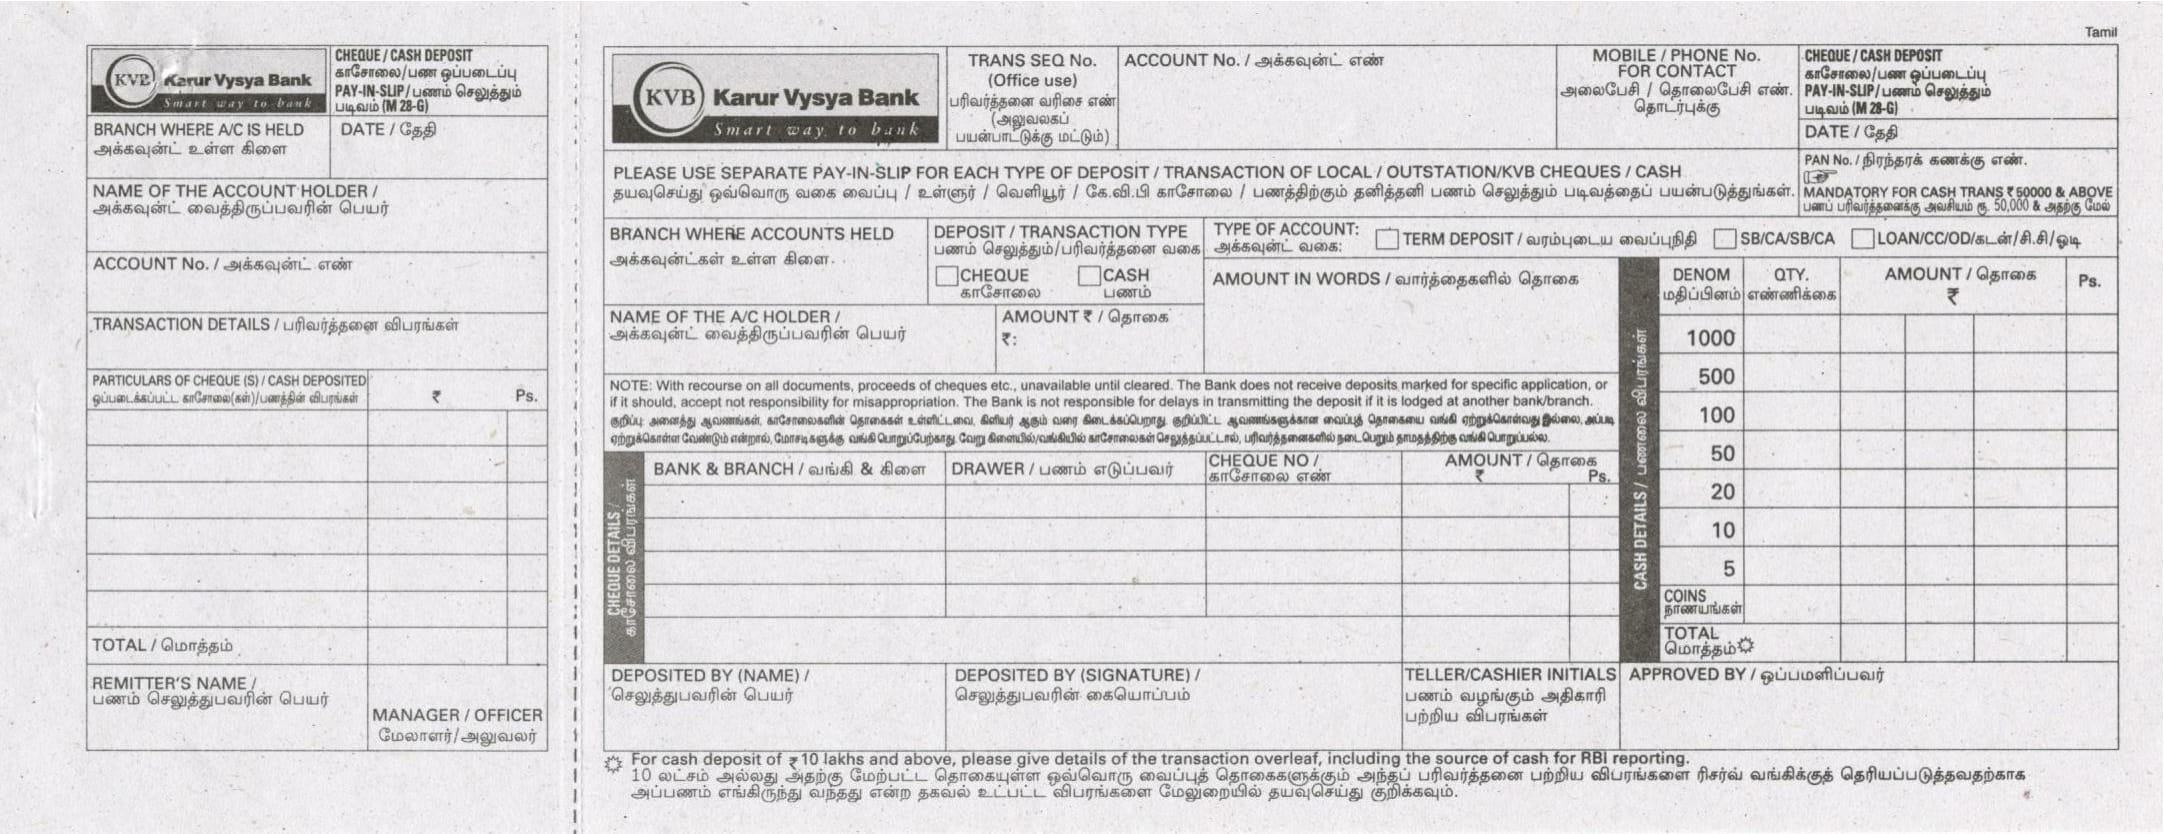 Karur Vysya Bank Cash and cheque deposit slip : Download in